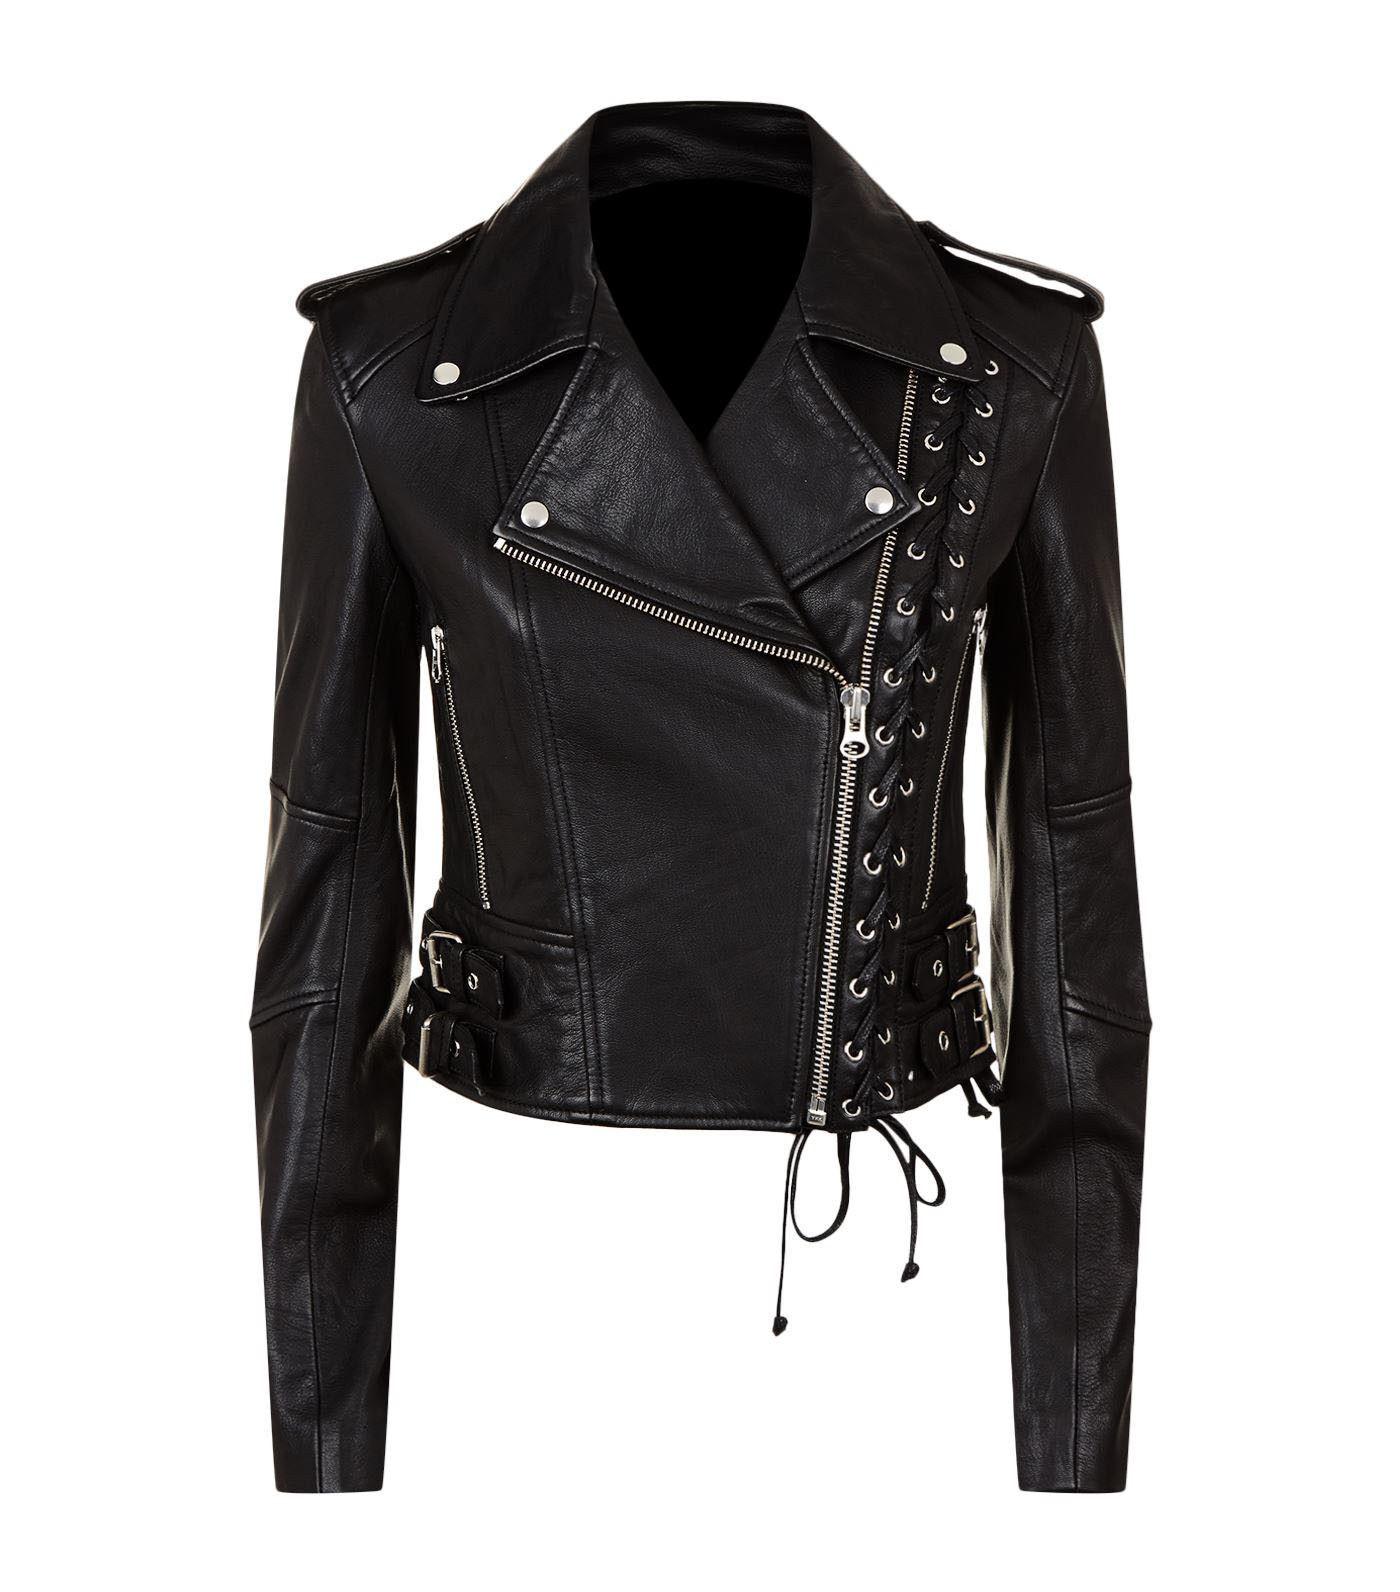 New Women's Black Slim Fit Moto Biker Style Real Leather Jac